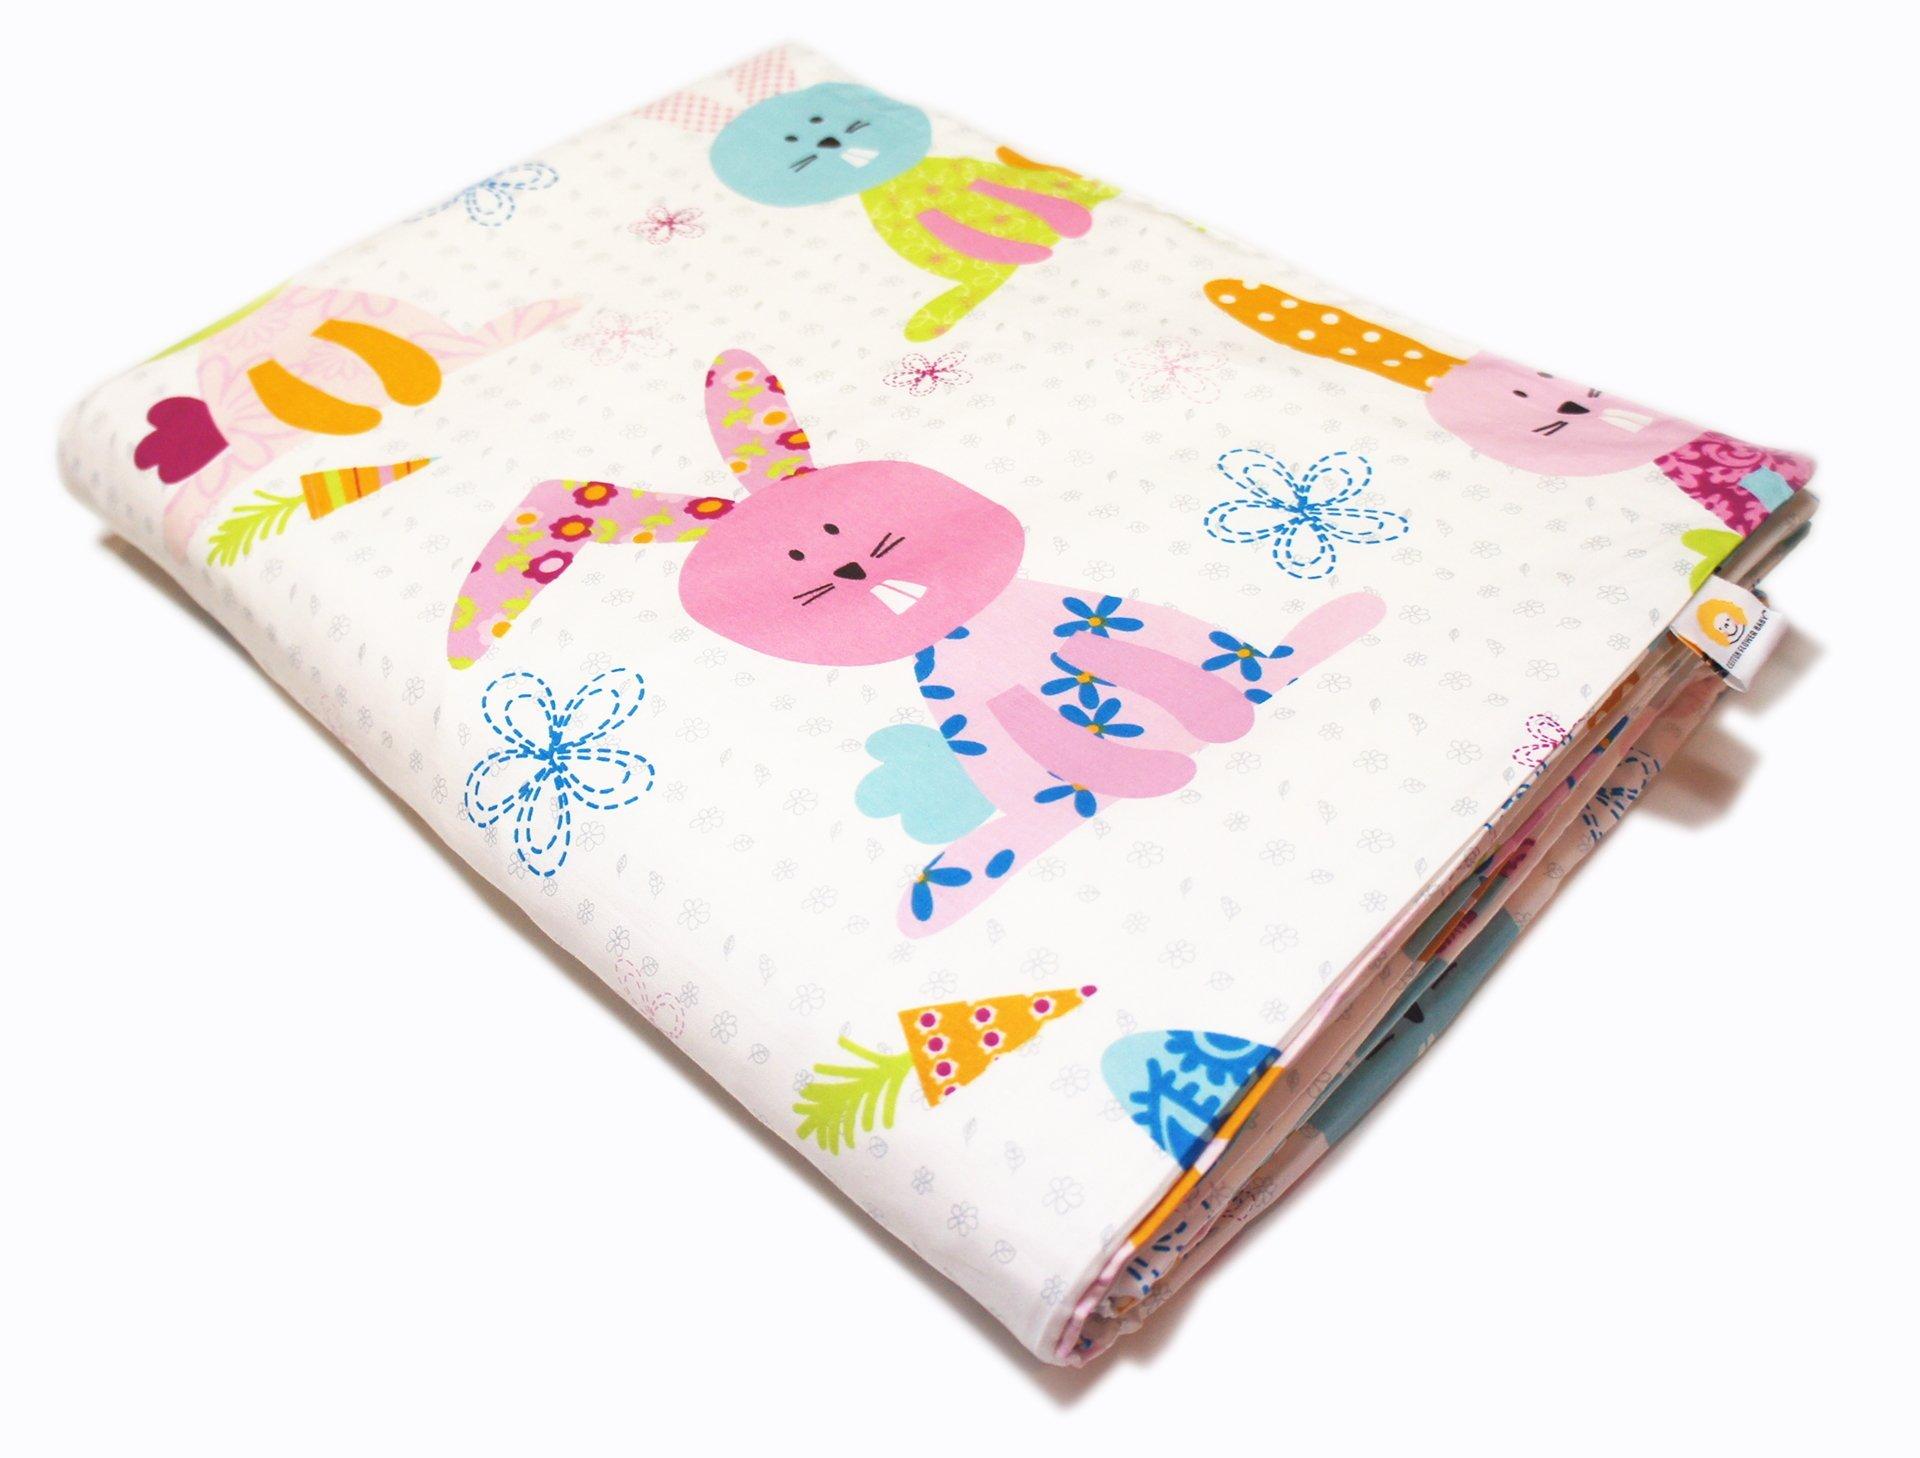 Cotton Flower Toddler Quilt (Quilt + Duvet Cover) (Happy Bunny)